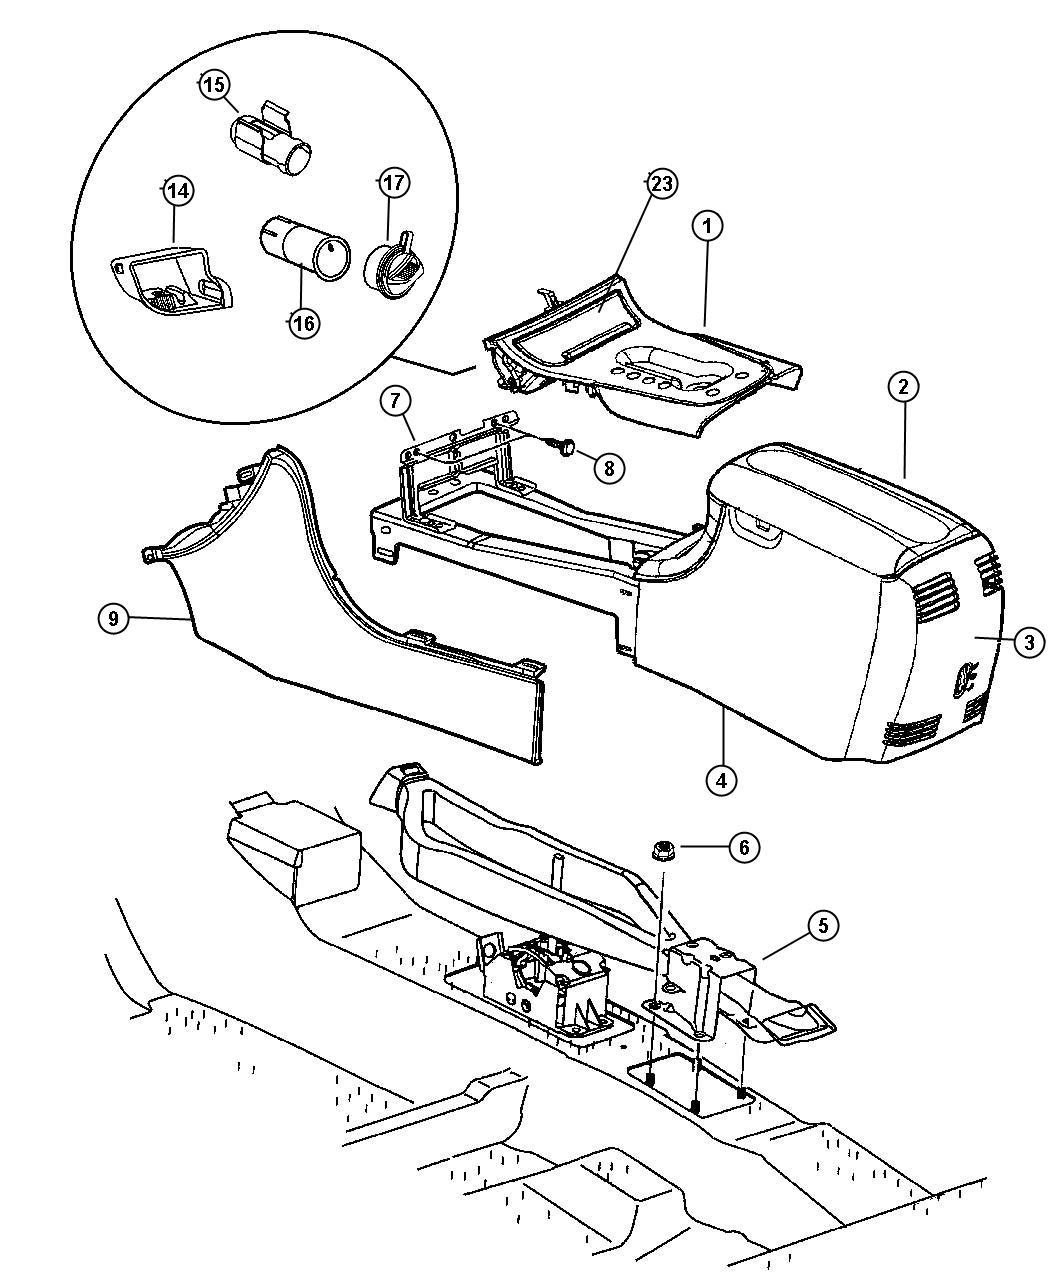 2002 Chrysler 300 Hood. Ash receiver lamp. Hood assembly